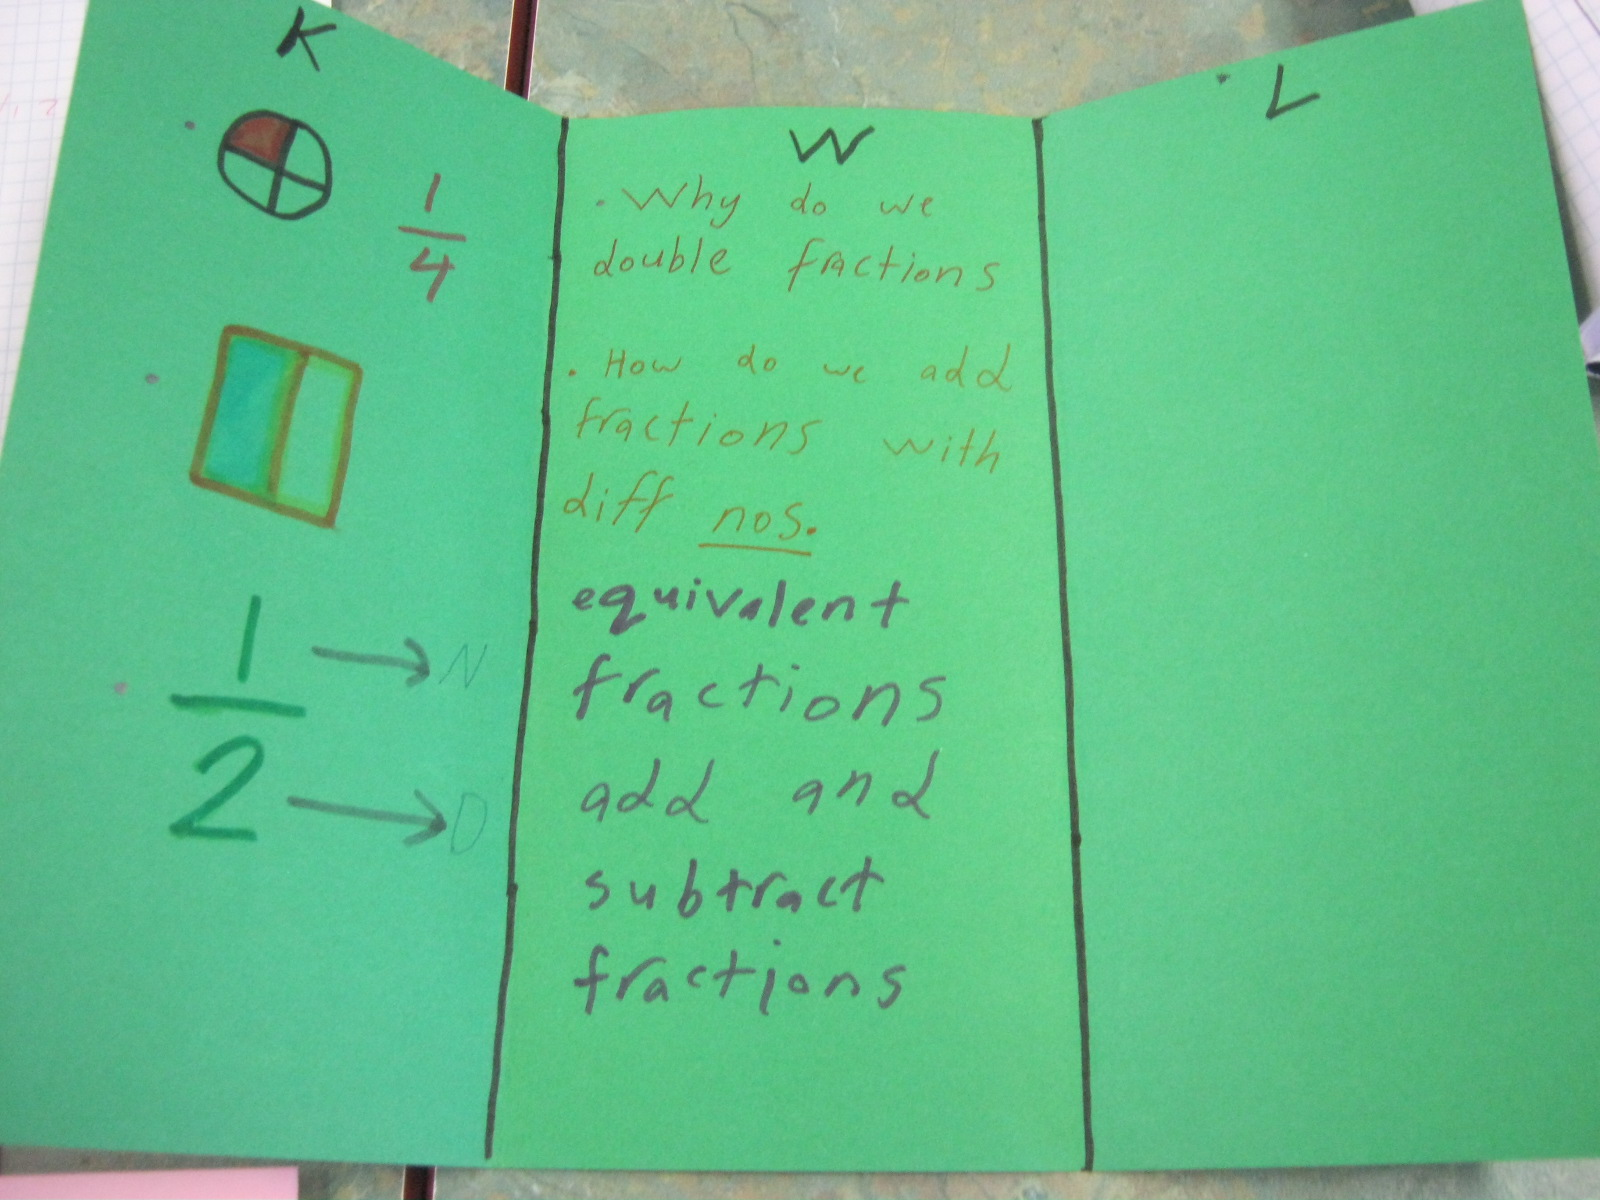 Miss A's Class Ideas: Fractions K-W-L Chart